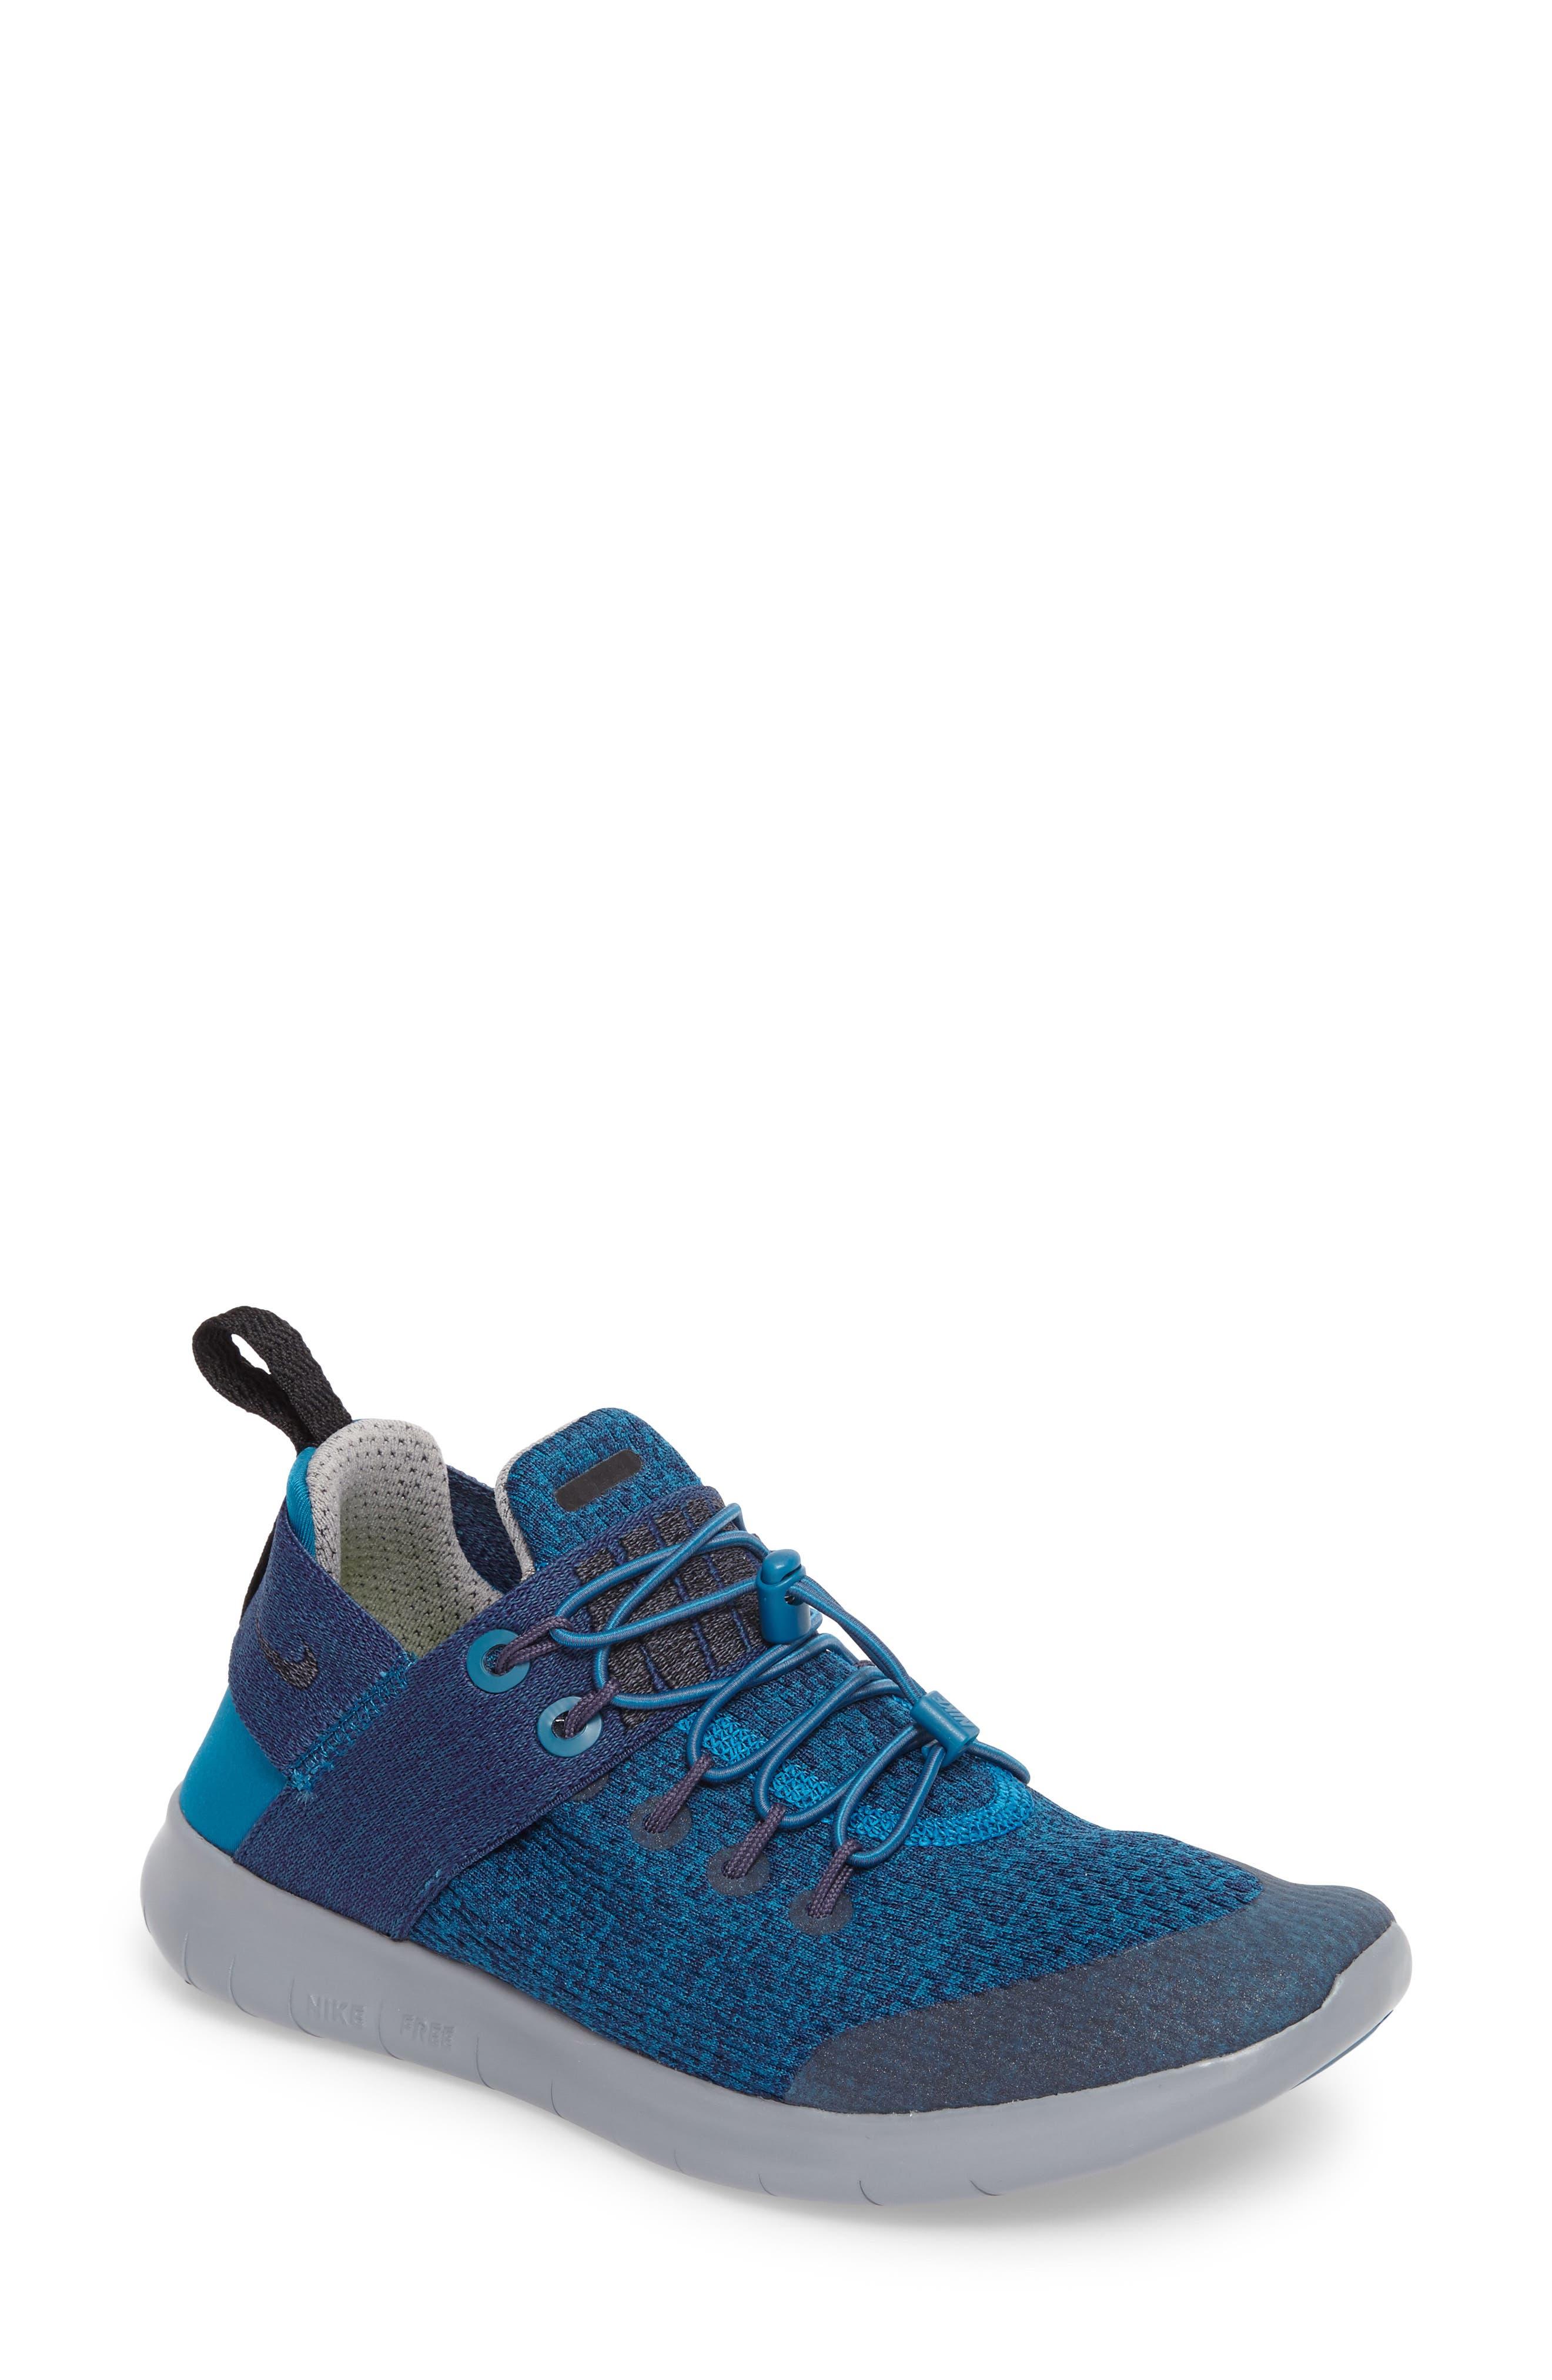 Free RN Commuter 2017 Premium Running Shoe,                         Main,                         color, Green / Black/ Cobblestone